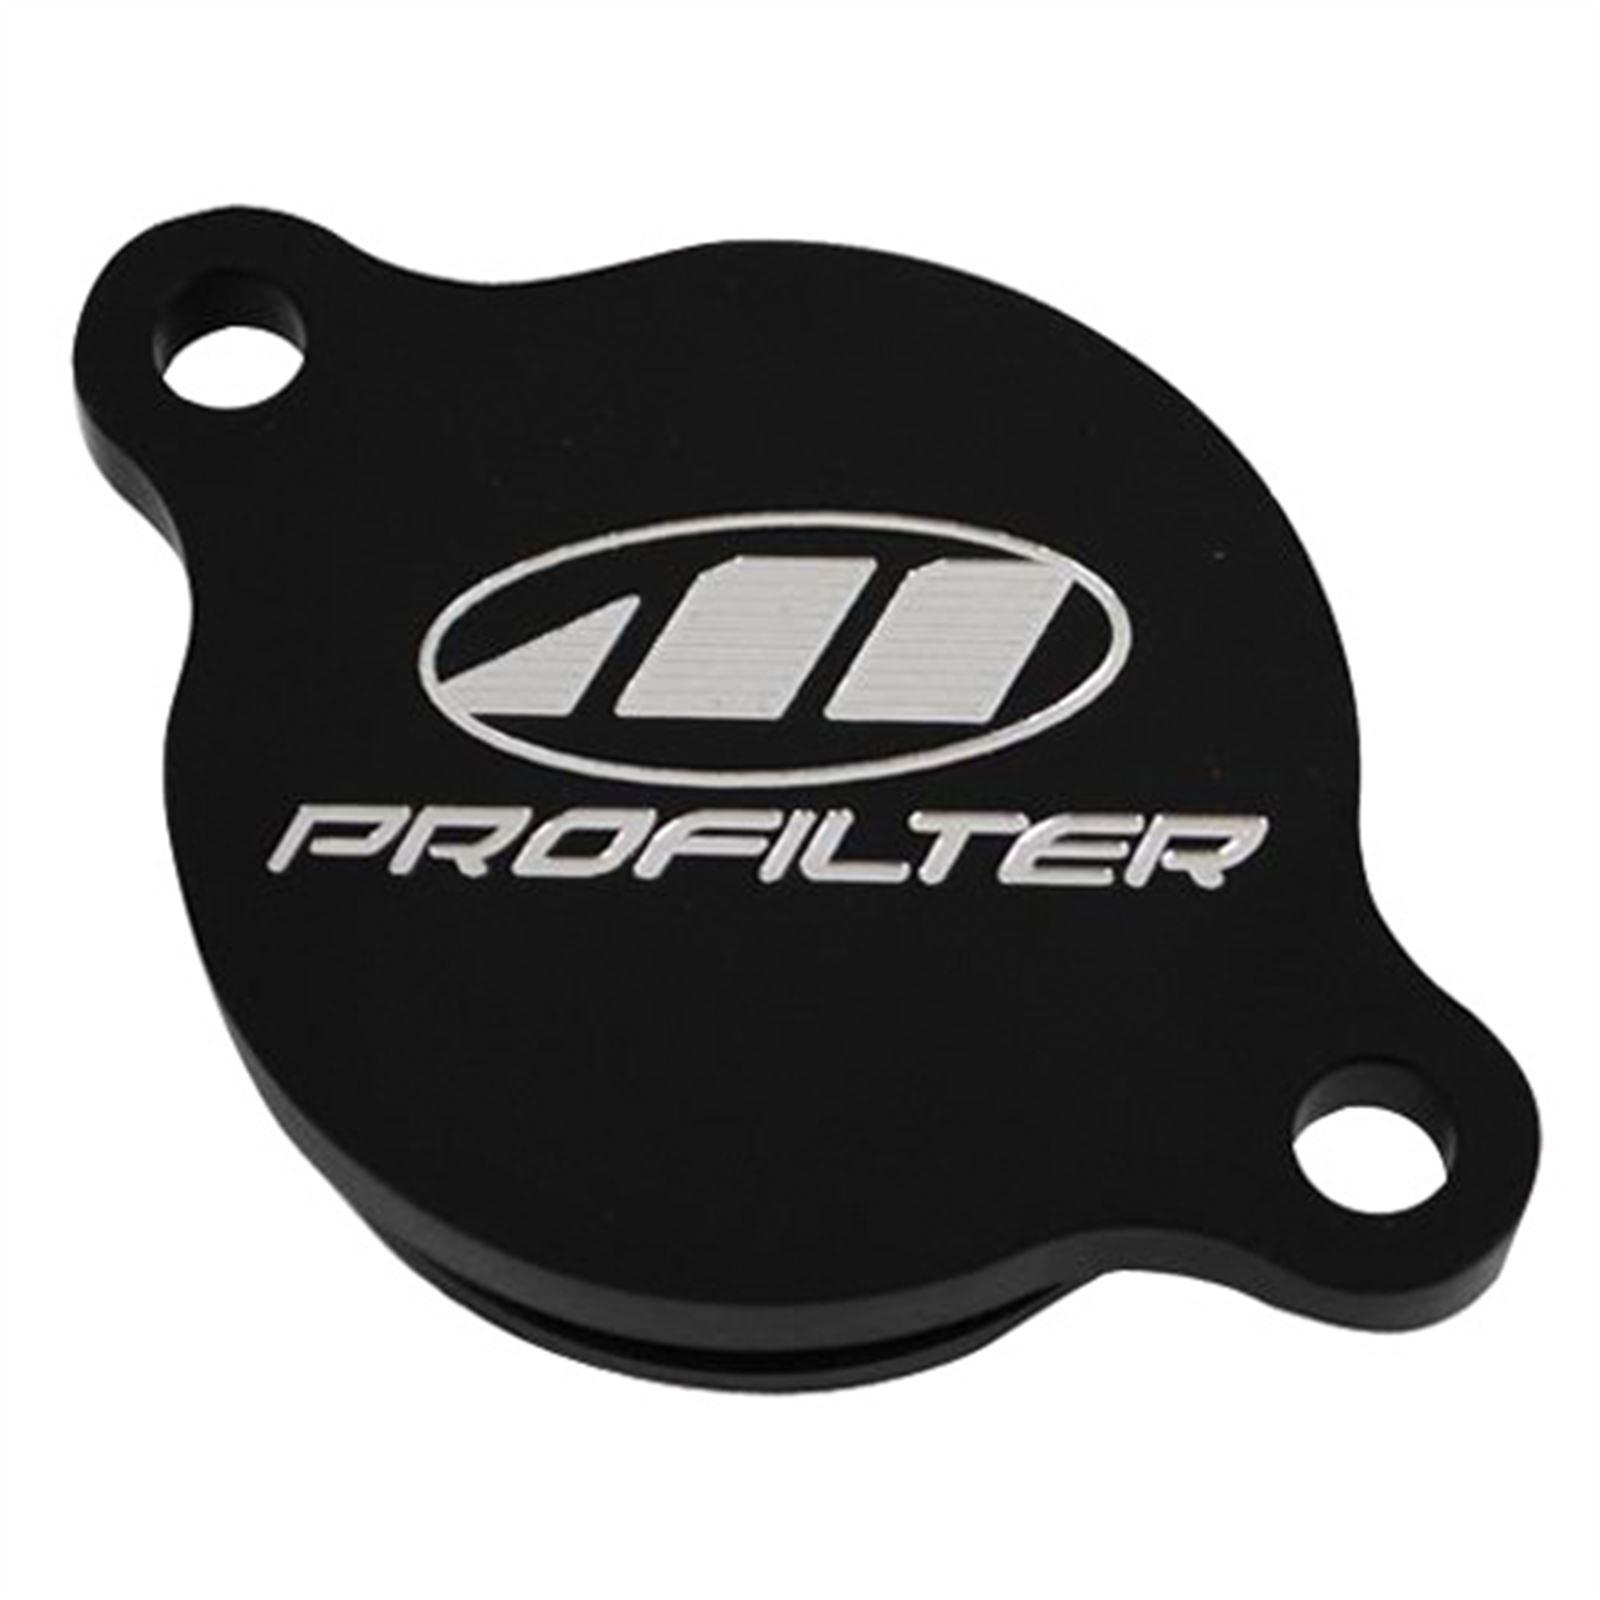 Pro Filter Oil Filter Cover - Aluminum